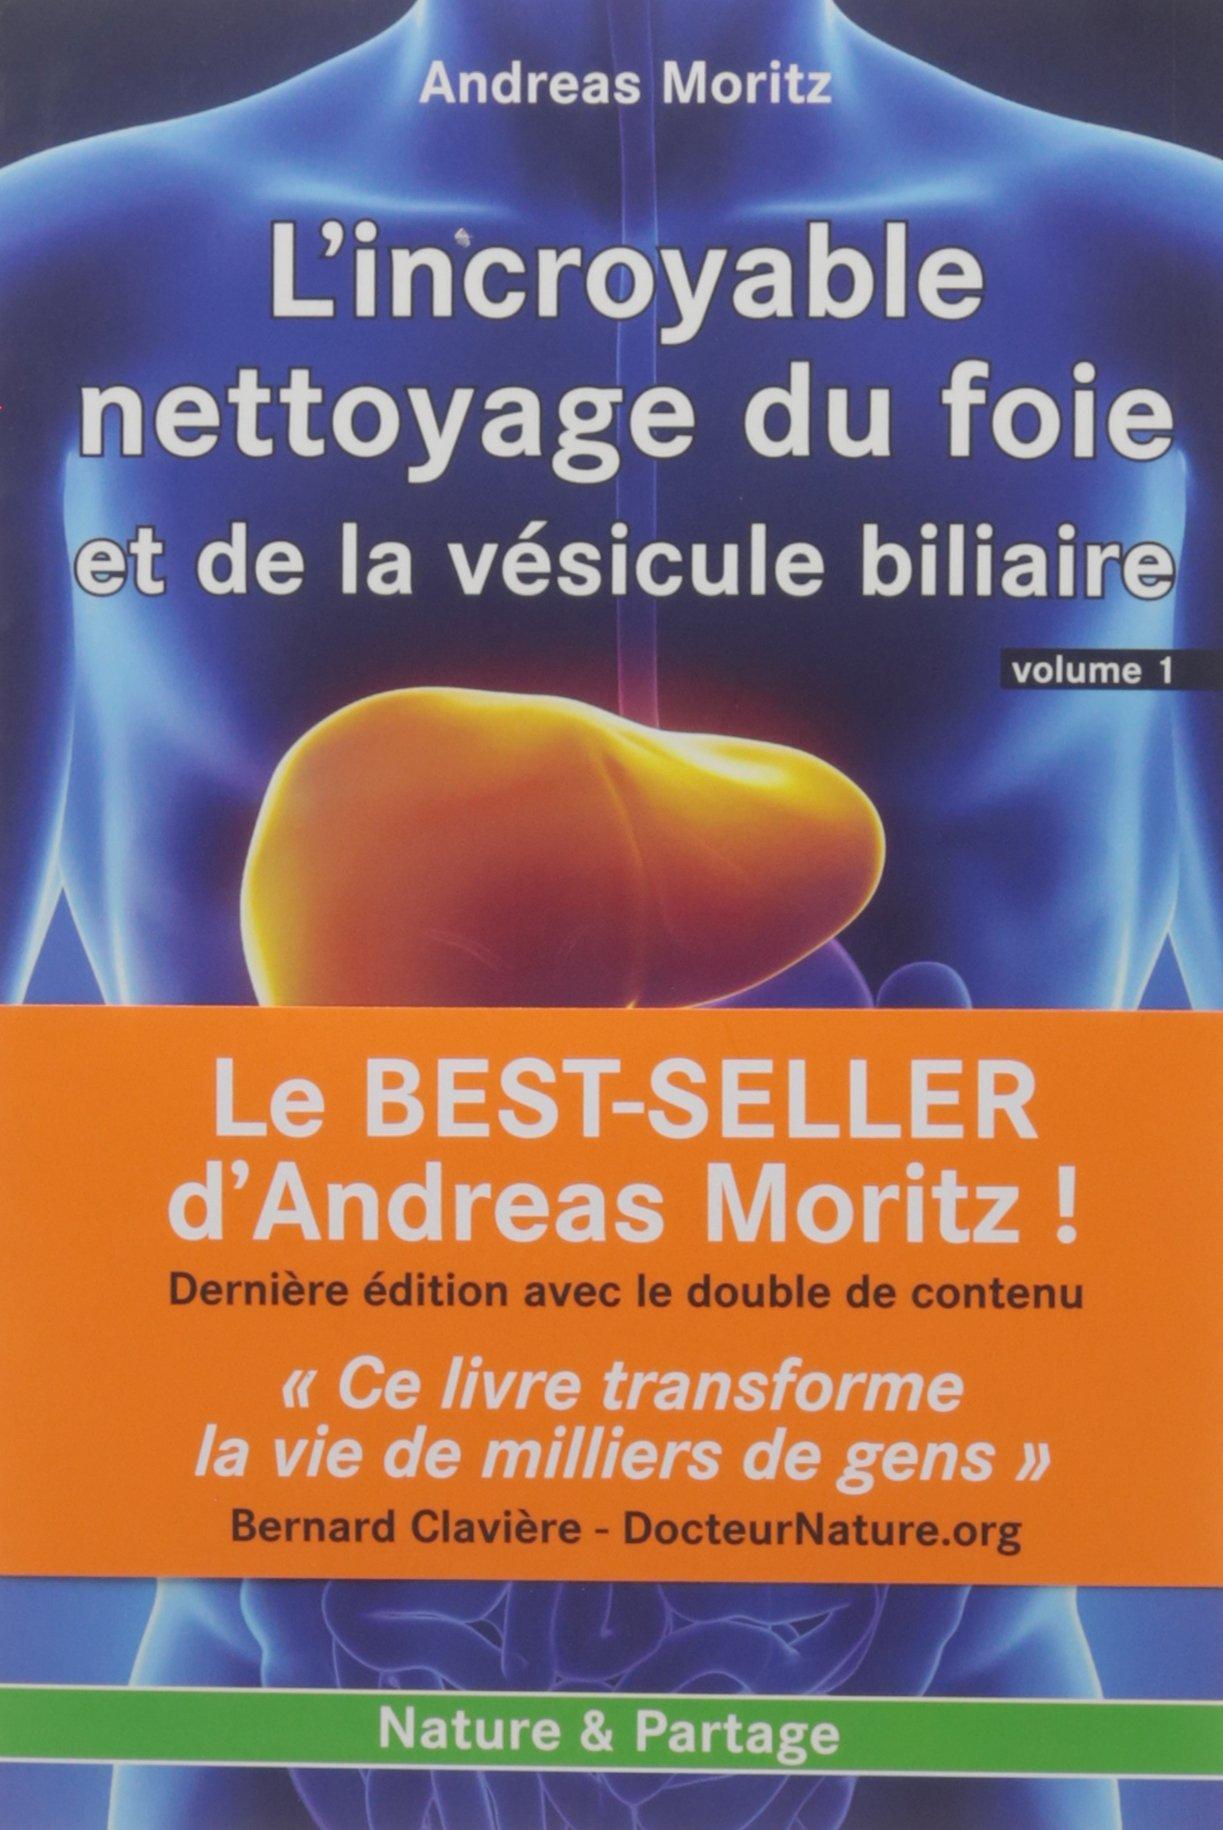 Nettoyage Vesicule Biliaire Danger : nettoyage, vesicule, biliaire, danger, L'étonnant, Nettoyage, Vésicule, Biliaire, Moritz